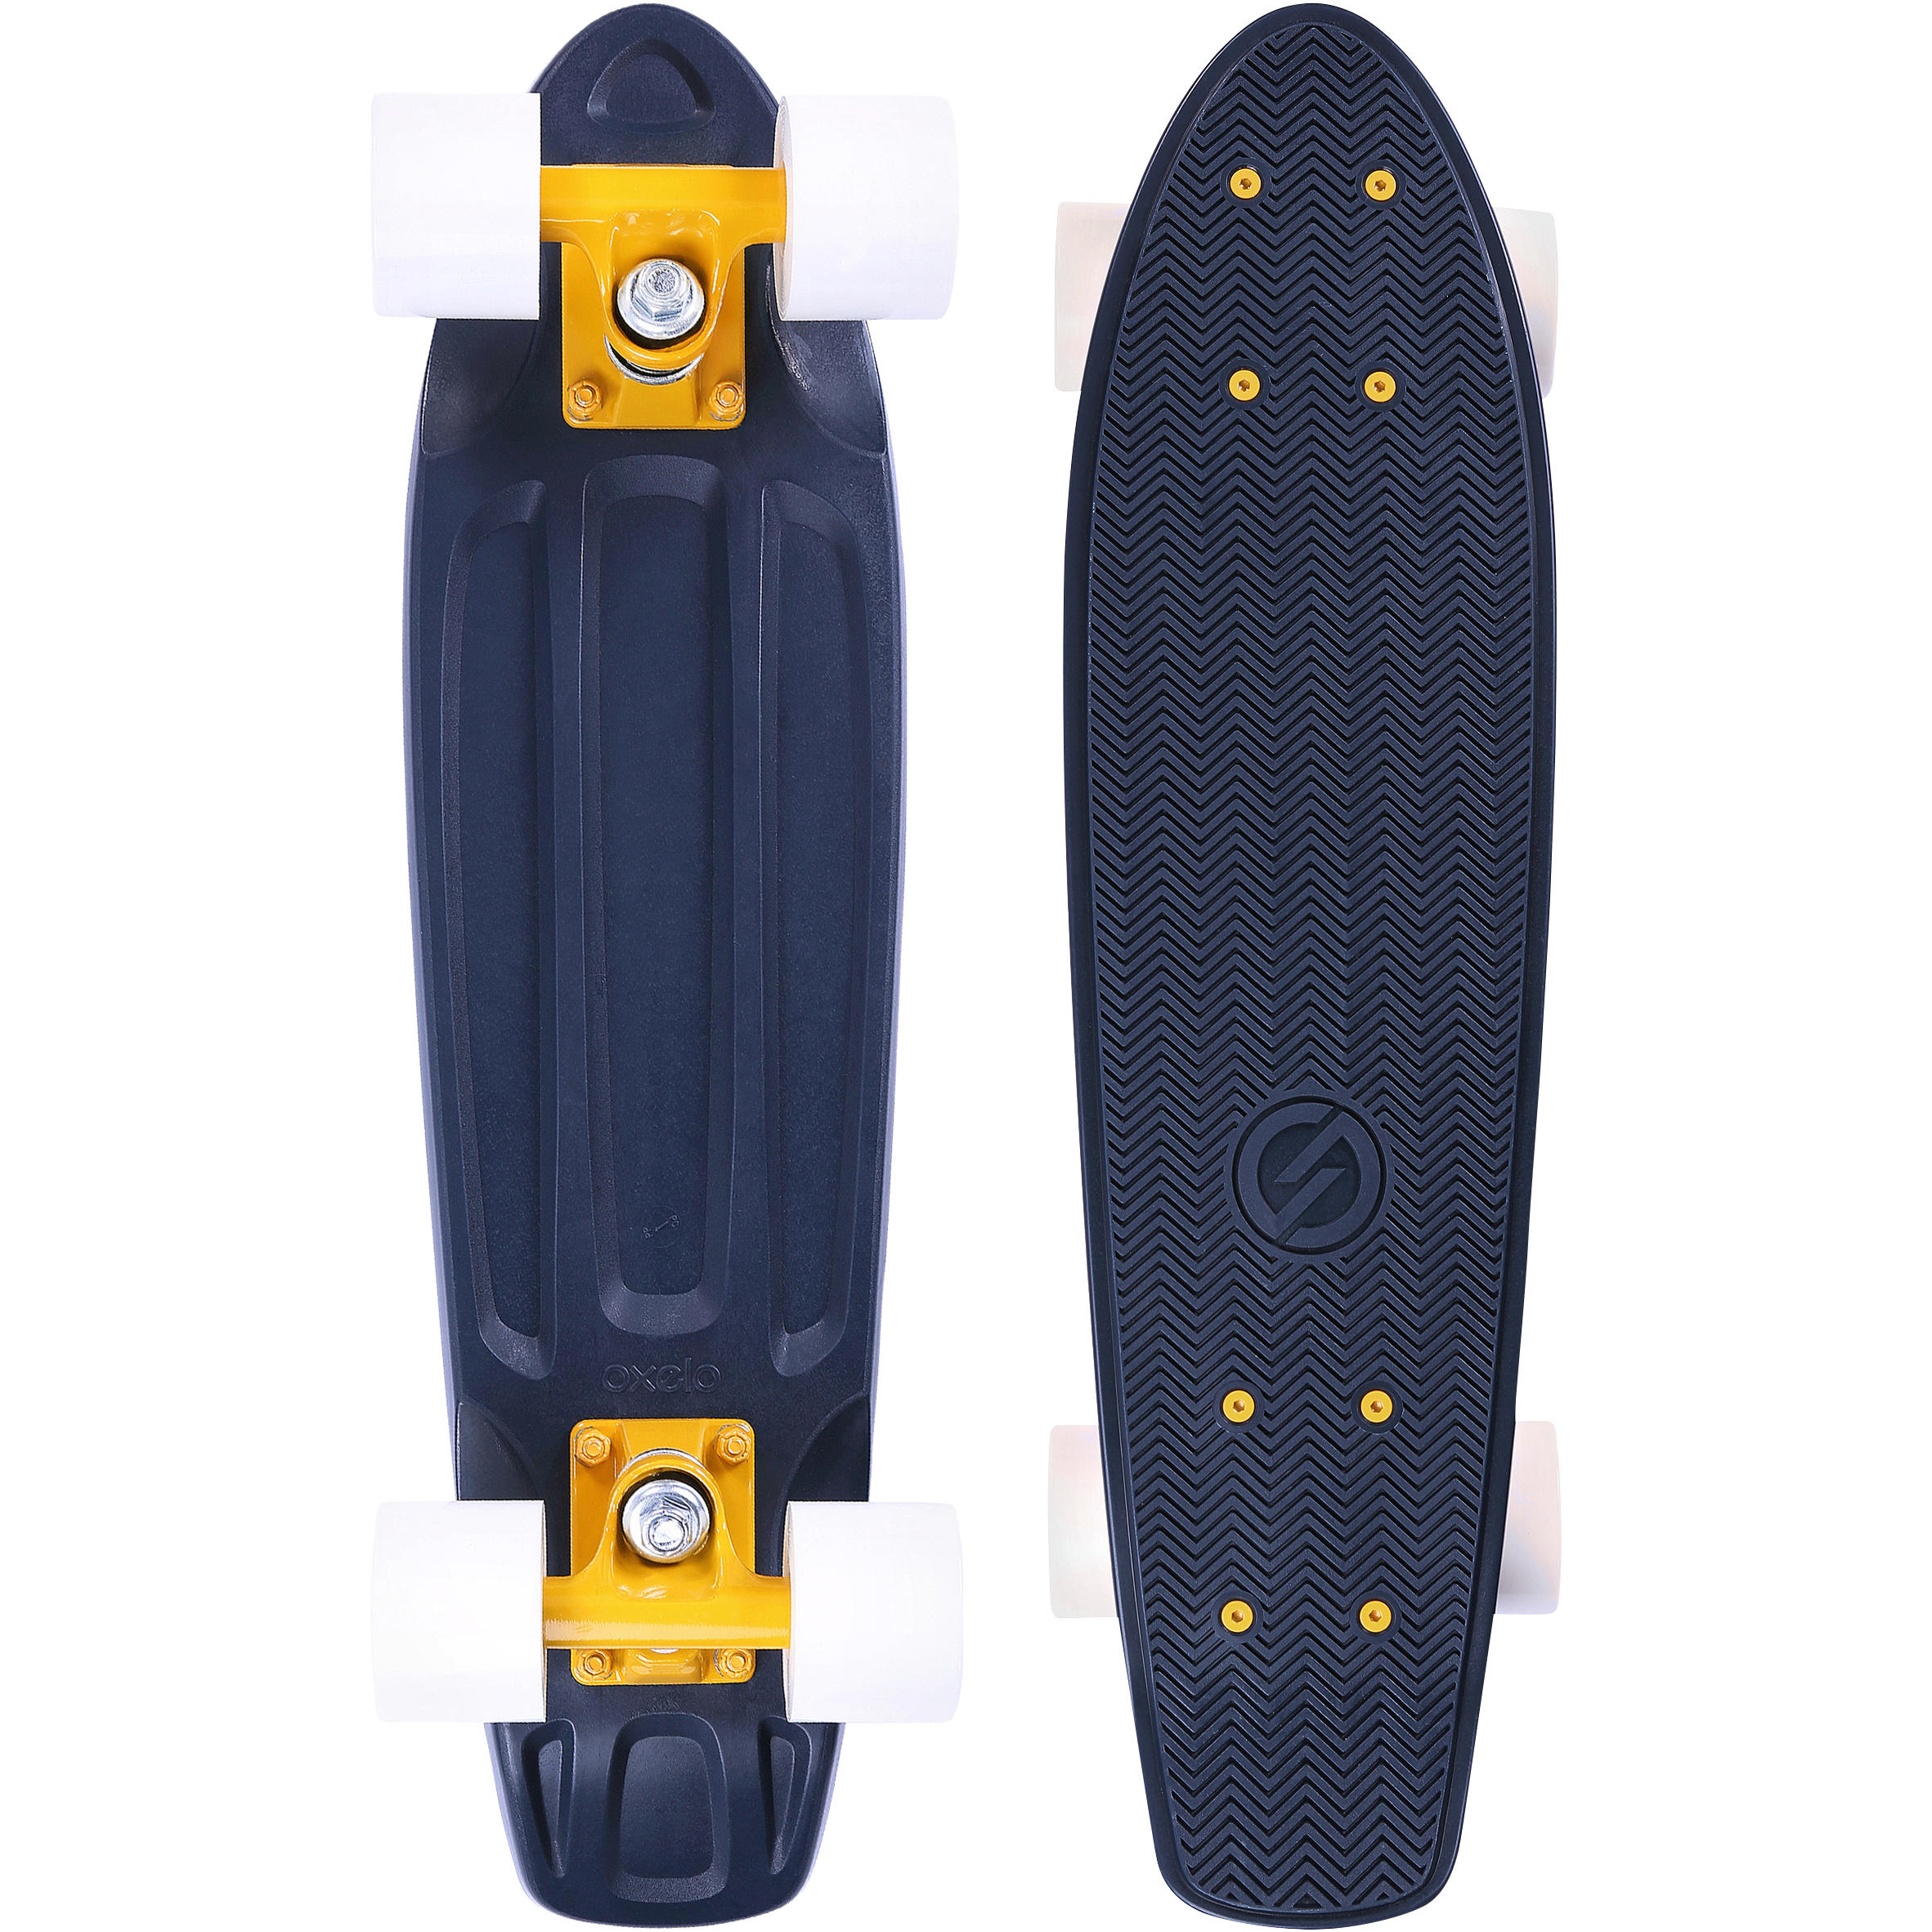 Yamba Cruiser Skateboard - Petroleum Black